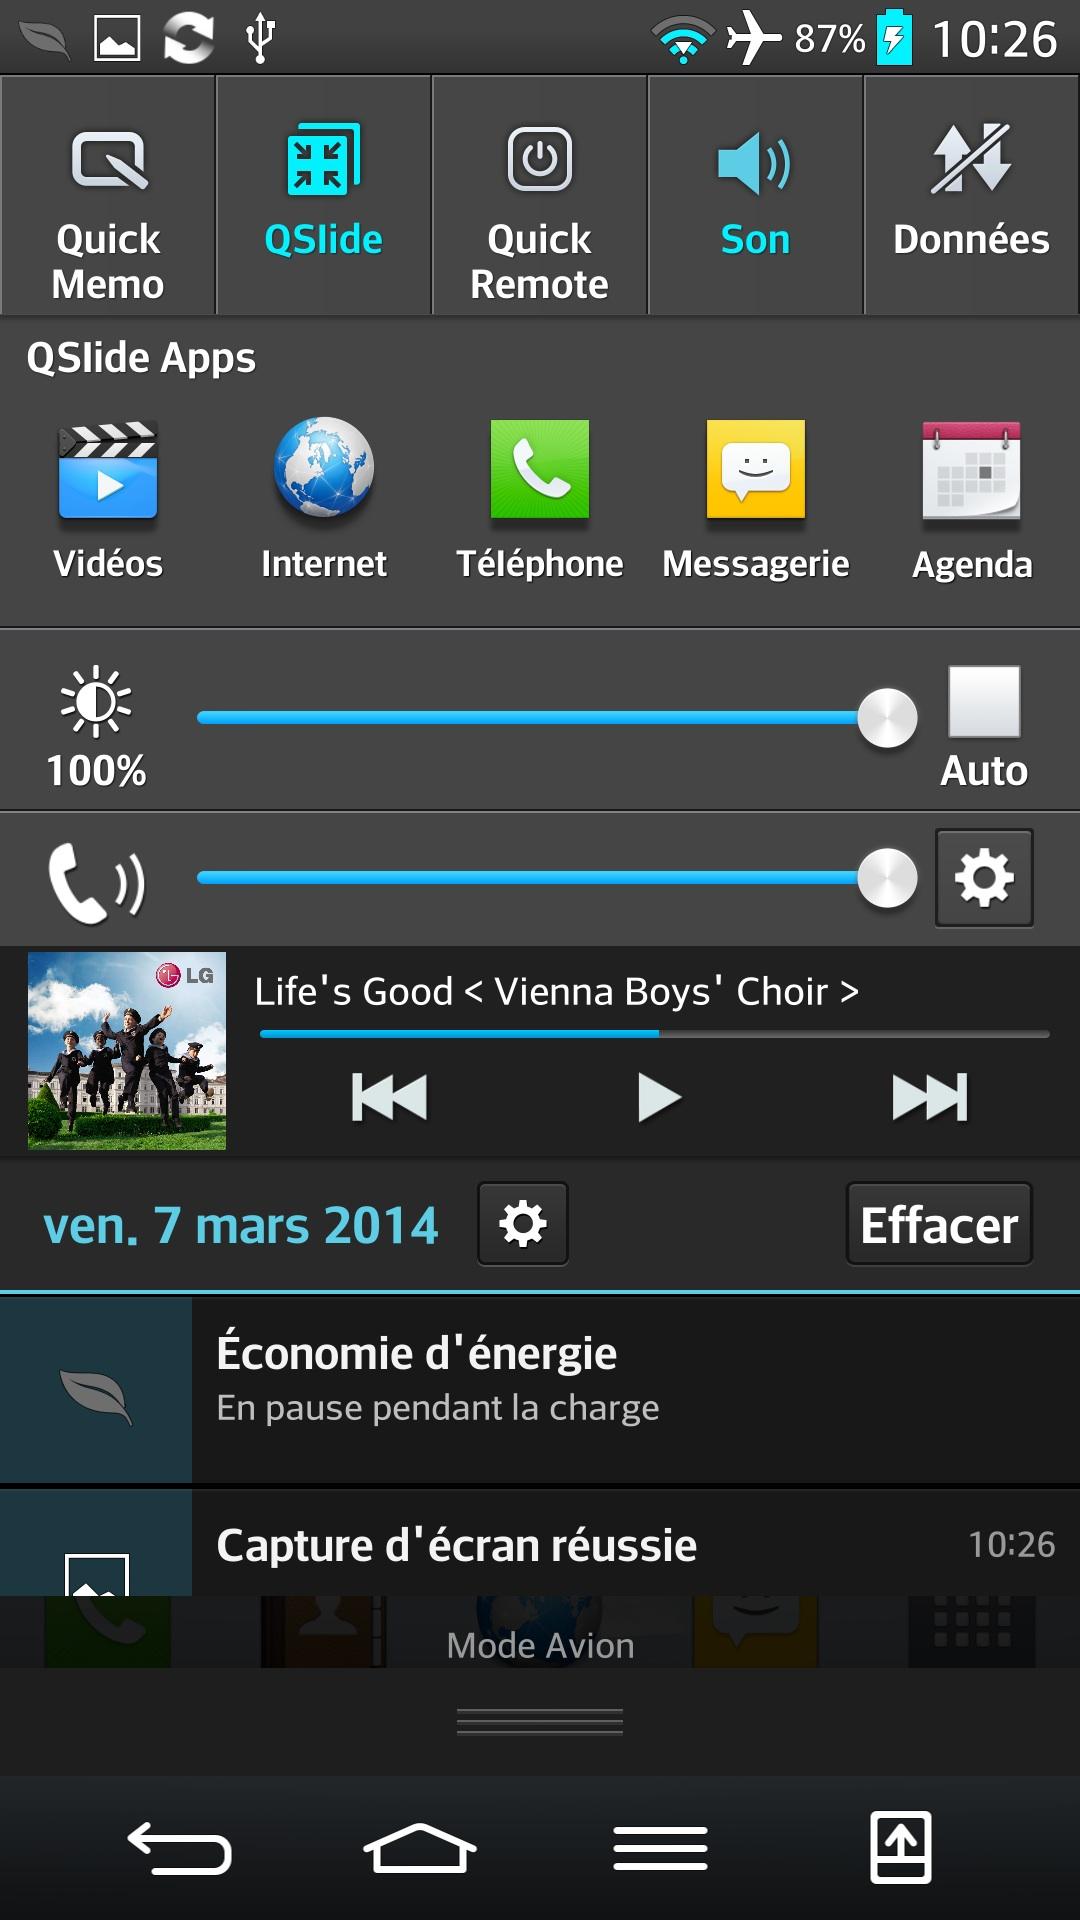 Screenshot_2014-03-07-10-26-33.jpeg